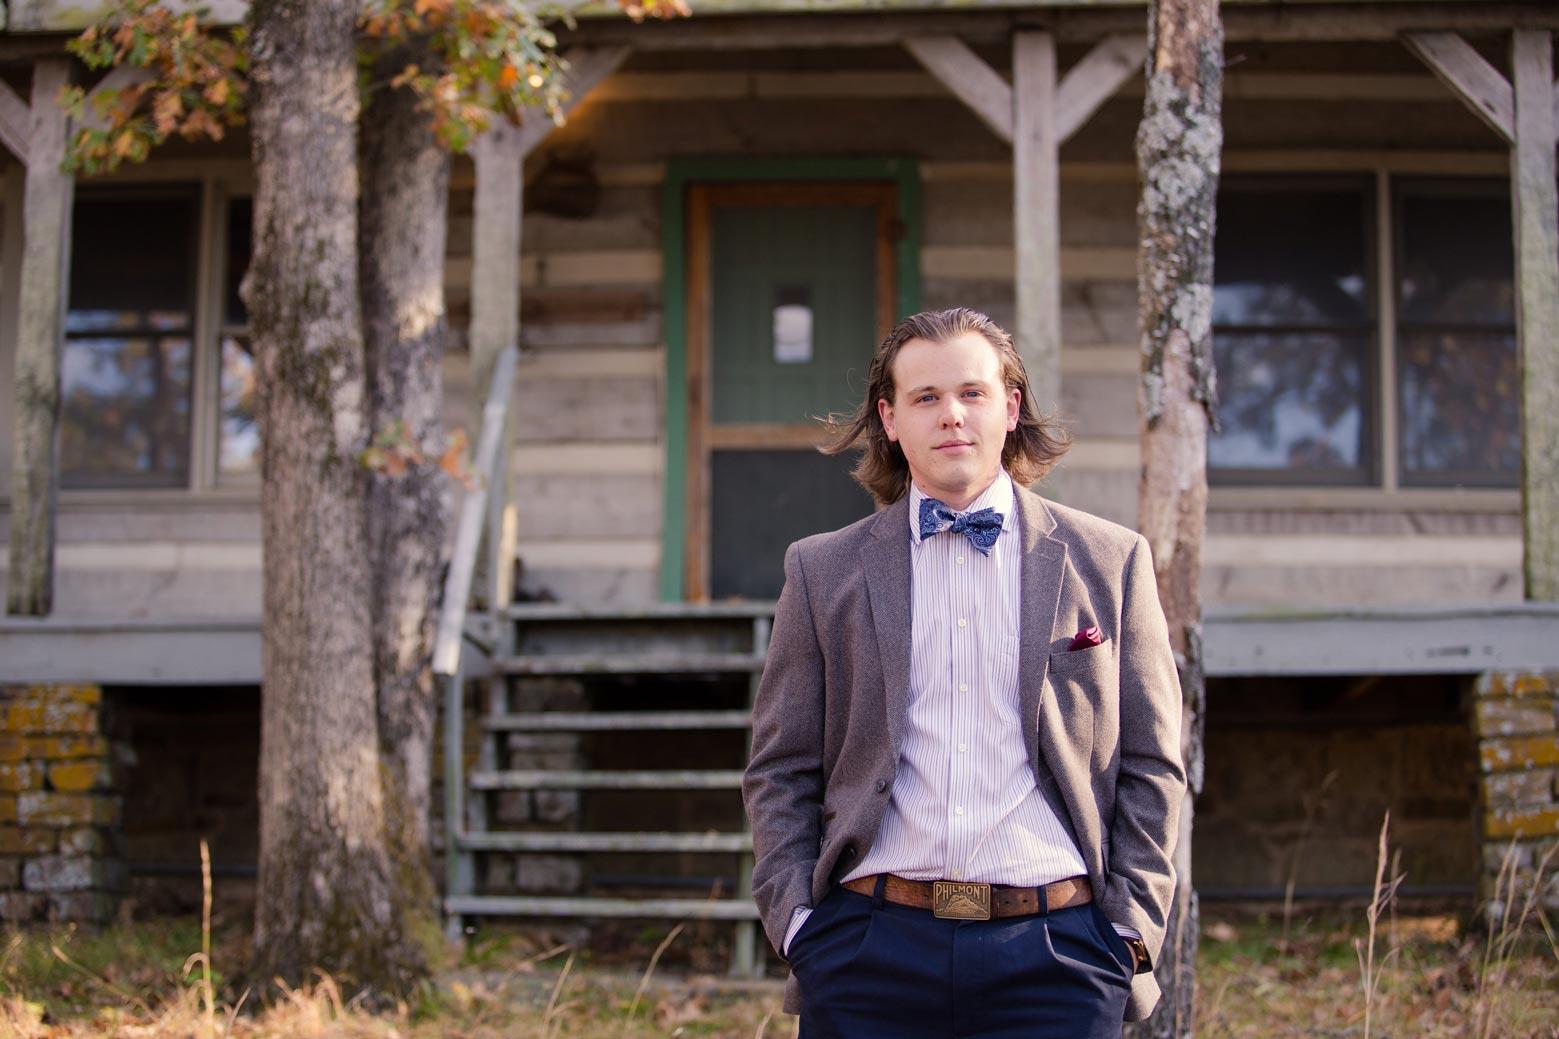 Rustic-Whimsical-Wedding- Tulsa-Wedding-FloristRobyns-Flower-Garden_Mallory-Hall-Photography11.jpg